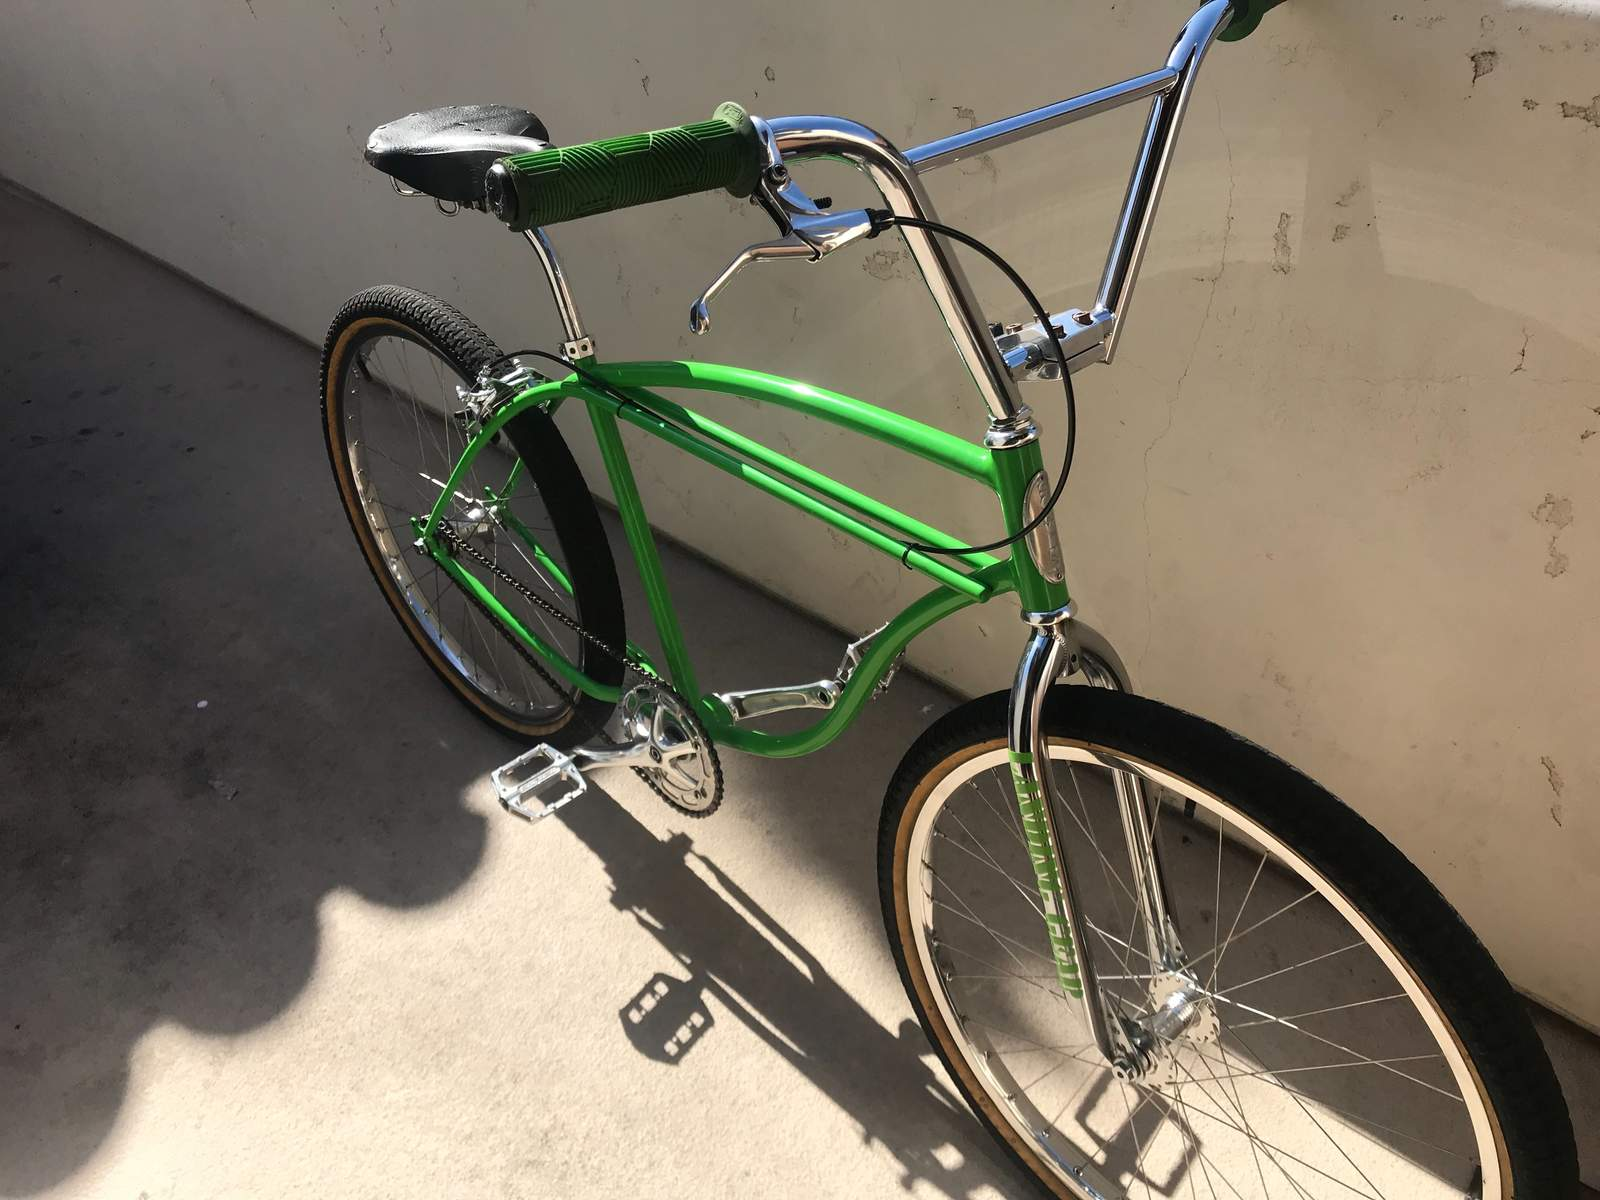 http://uploads.bmxmuseum.com/user-images/246751/bike5d235c9ae9.jpg